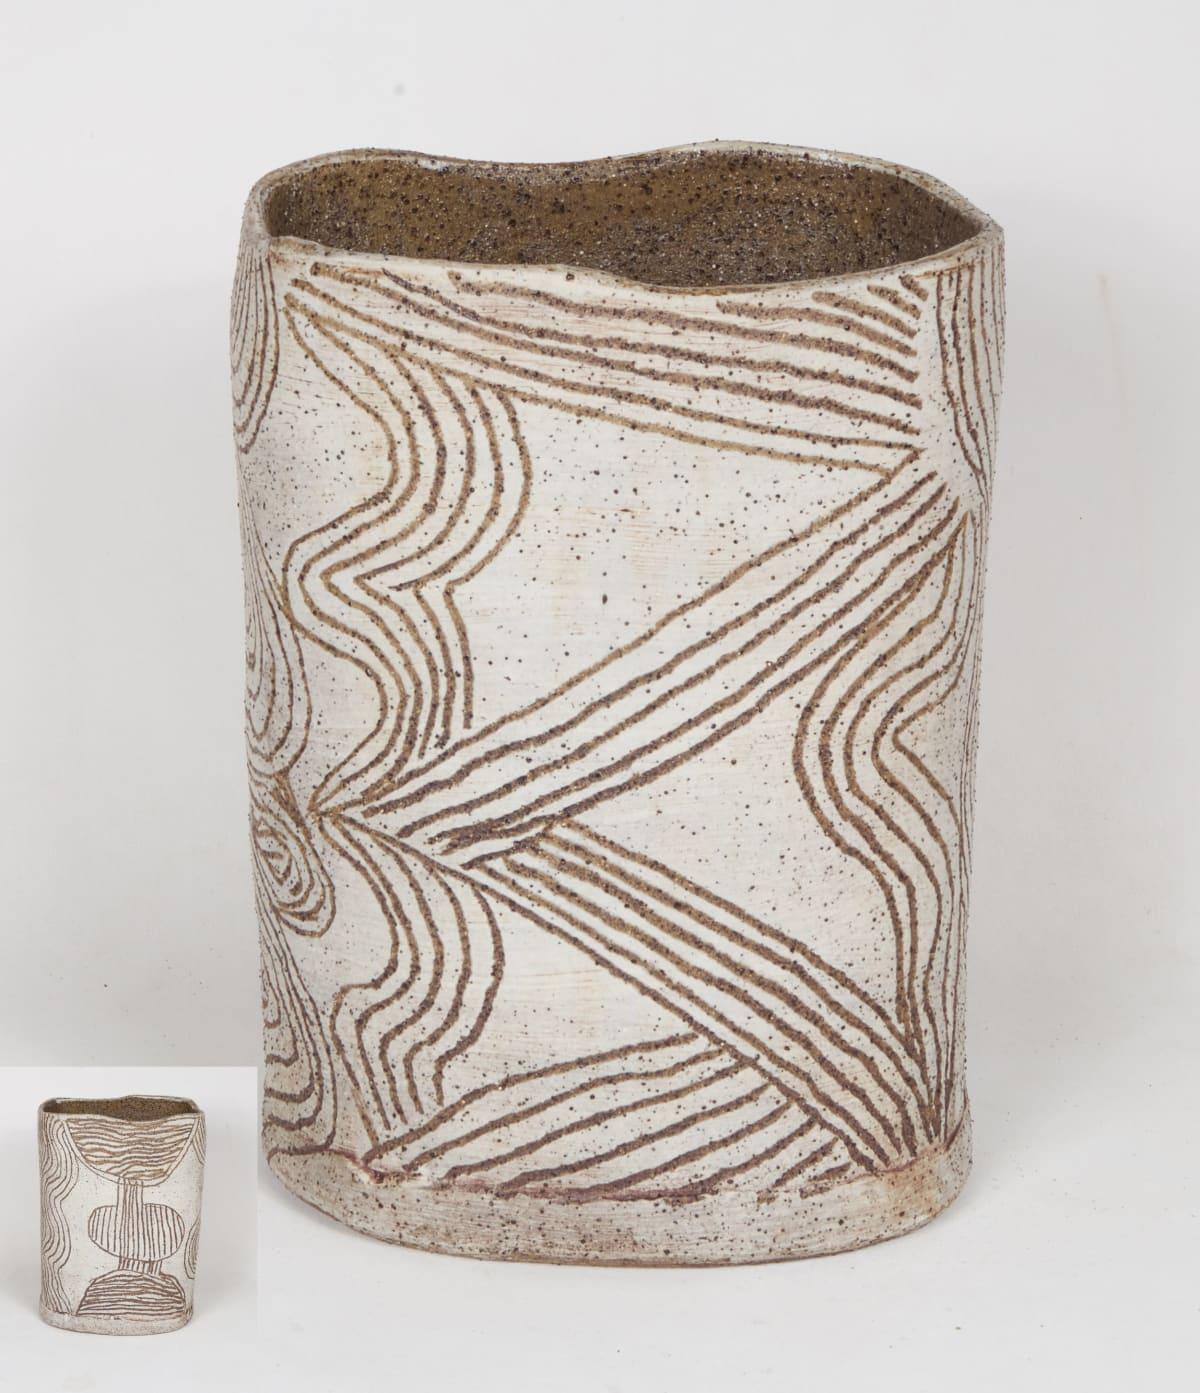 Rupert Jack Maku Maku, 2018 Stoneware 32 x 22 cm